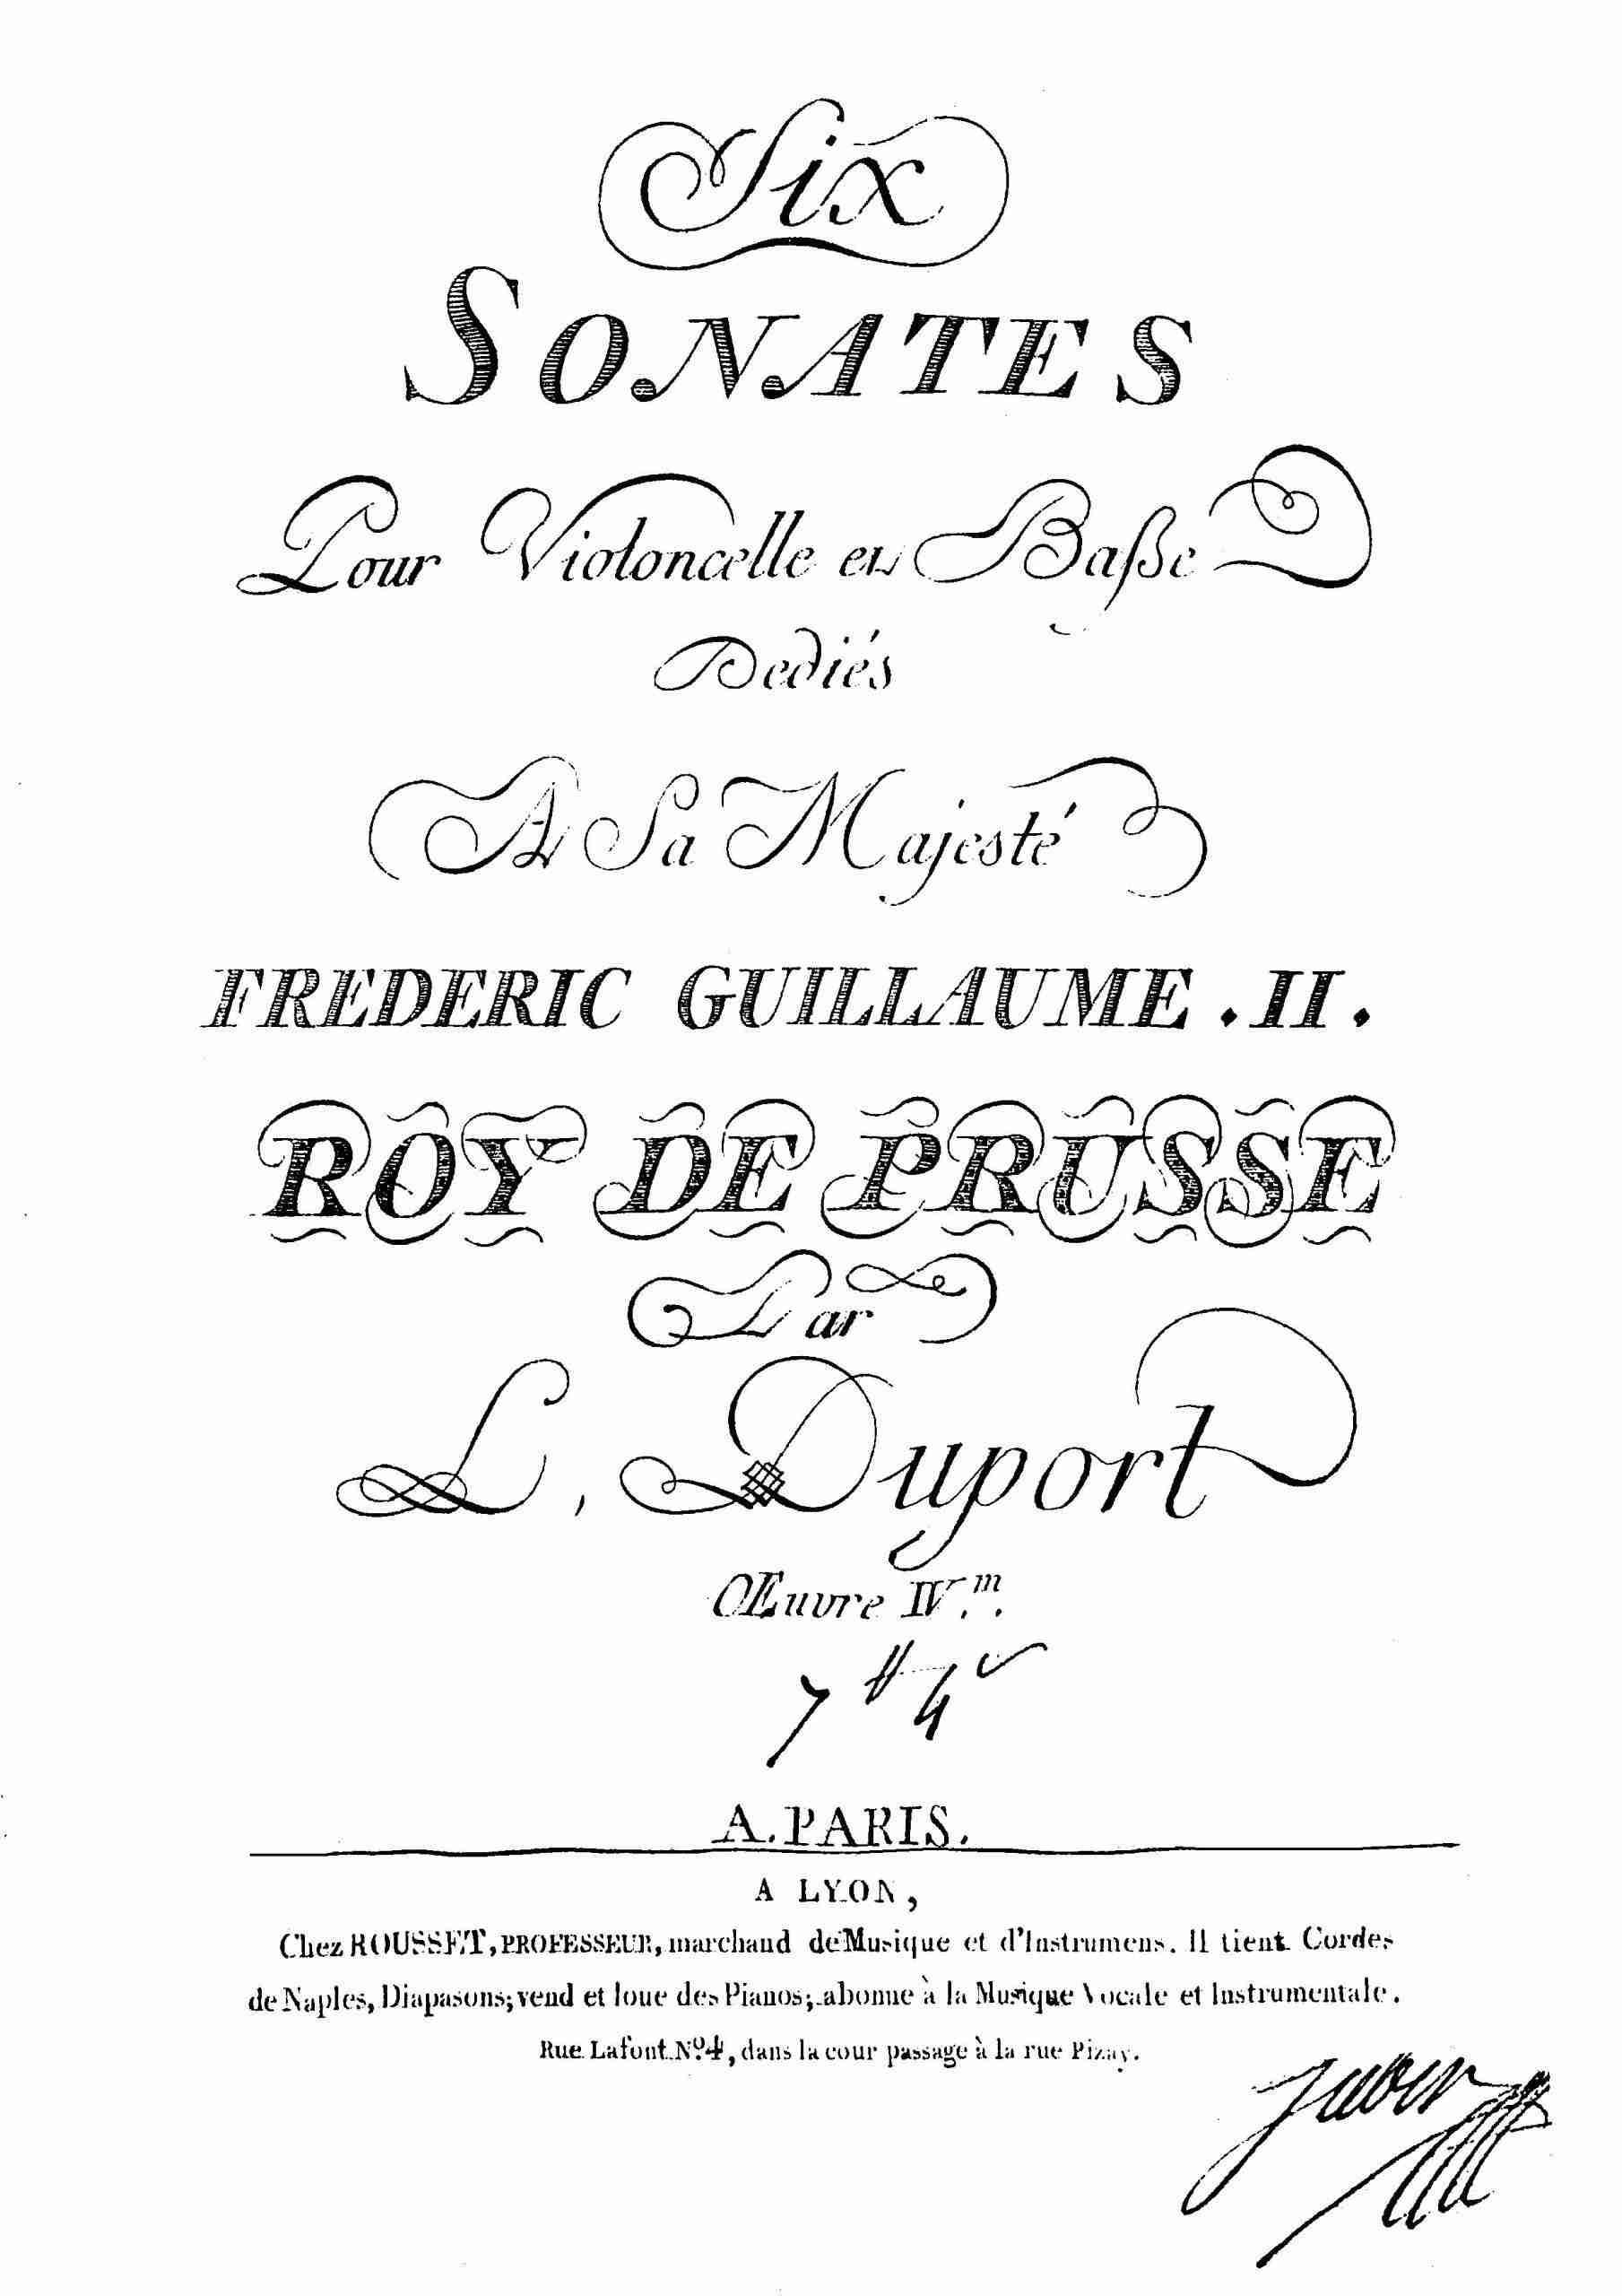 Duport, Jean-Louis - 6 Cello Sonatas, Op.4